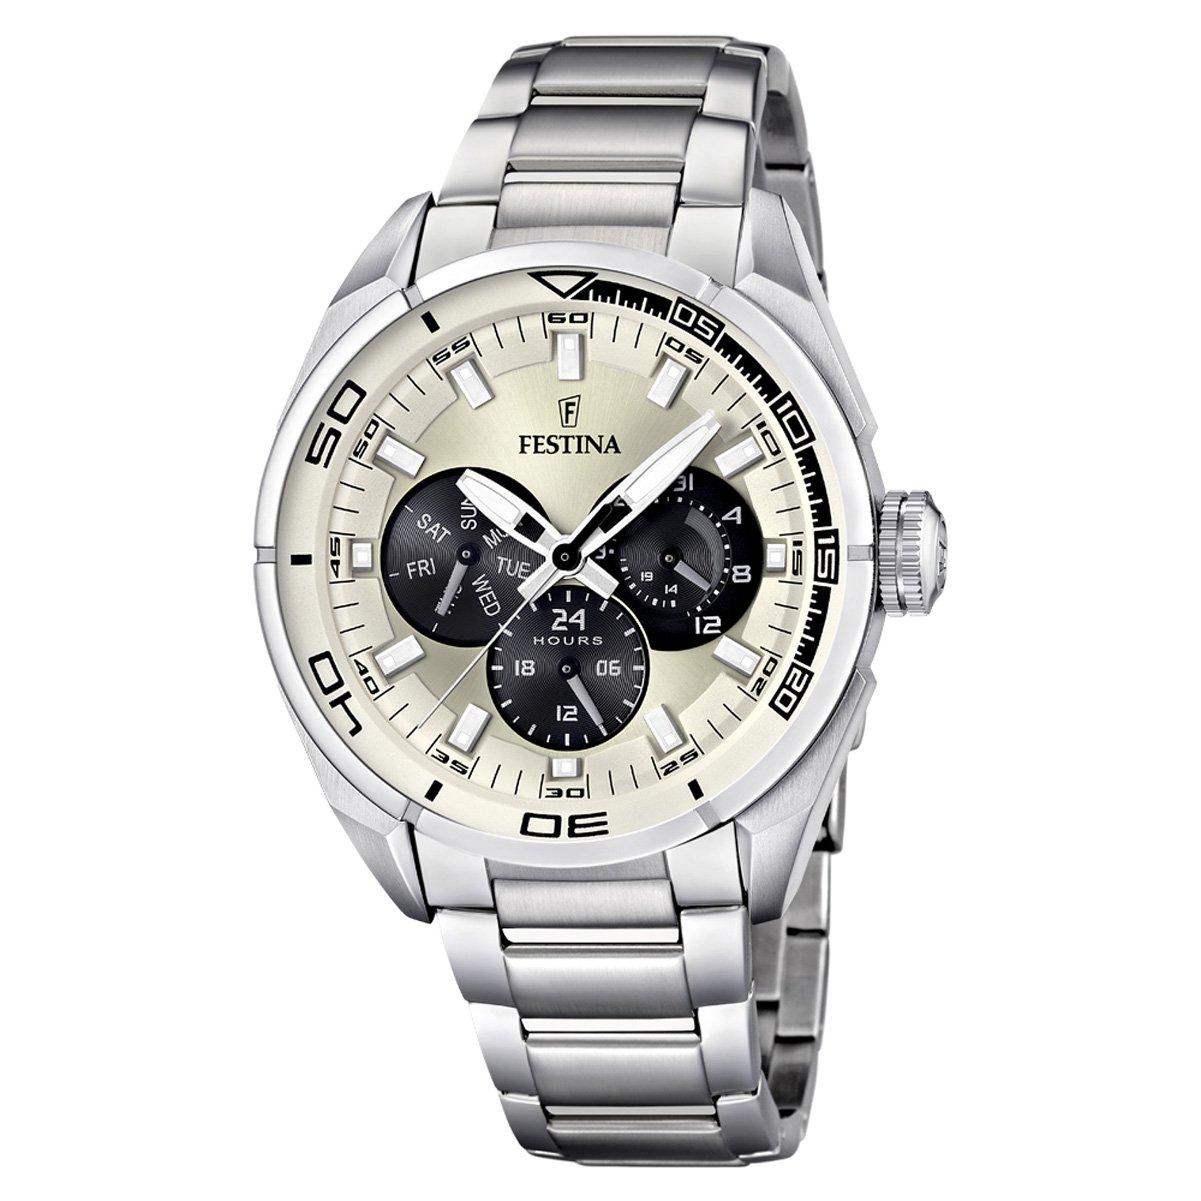 Festina Sport Multifunktion F16608/2 - Reloj analógico de Cuarzo para Hombre, Correa de Acero Inoxidable Color Plateado (Agujas luminiscentes)